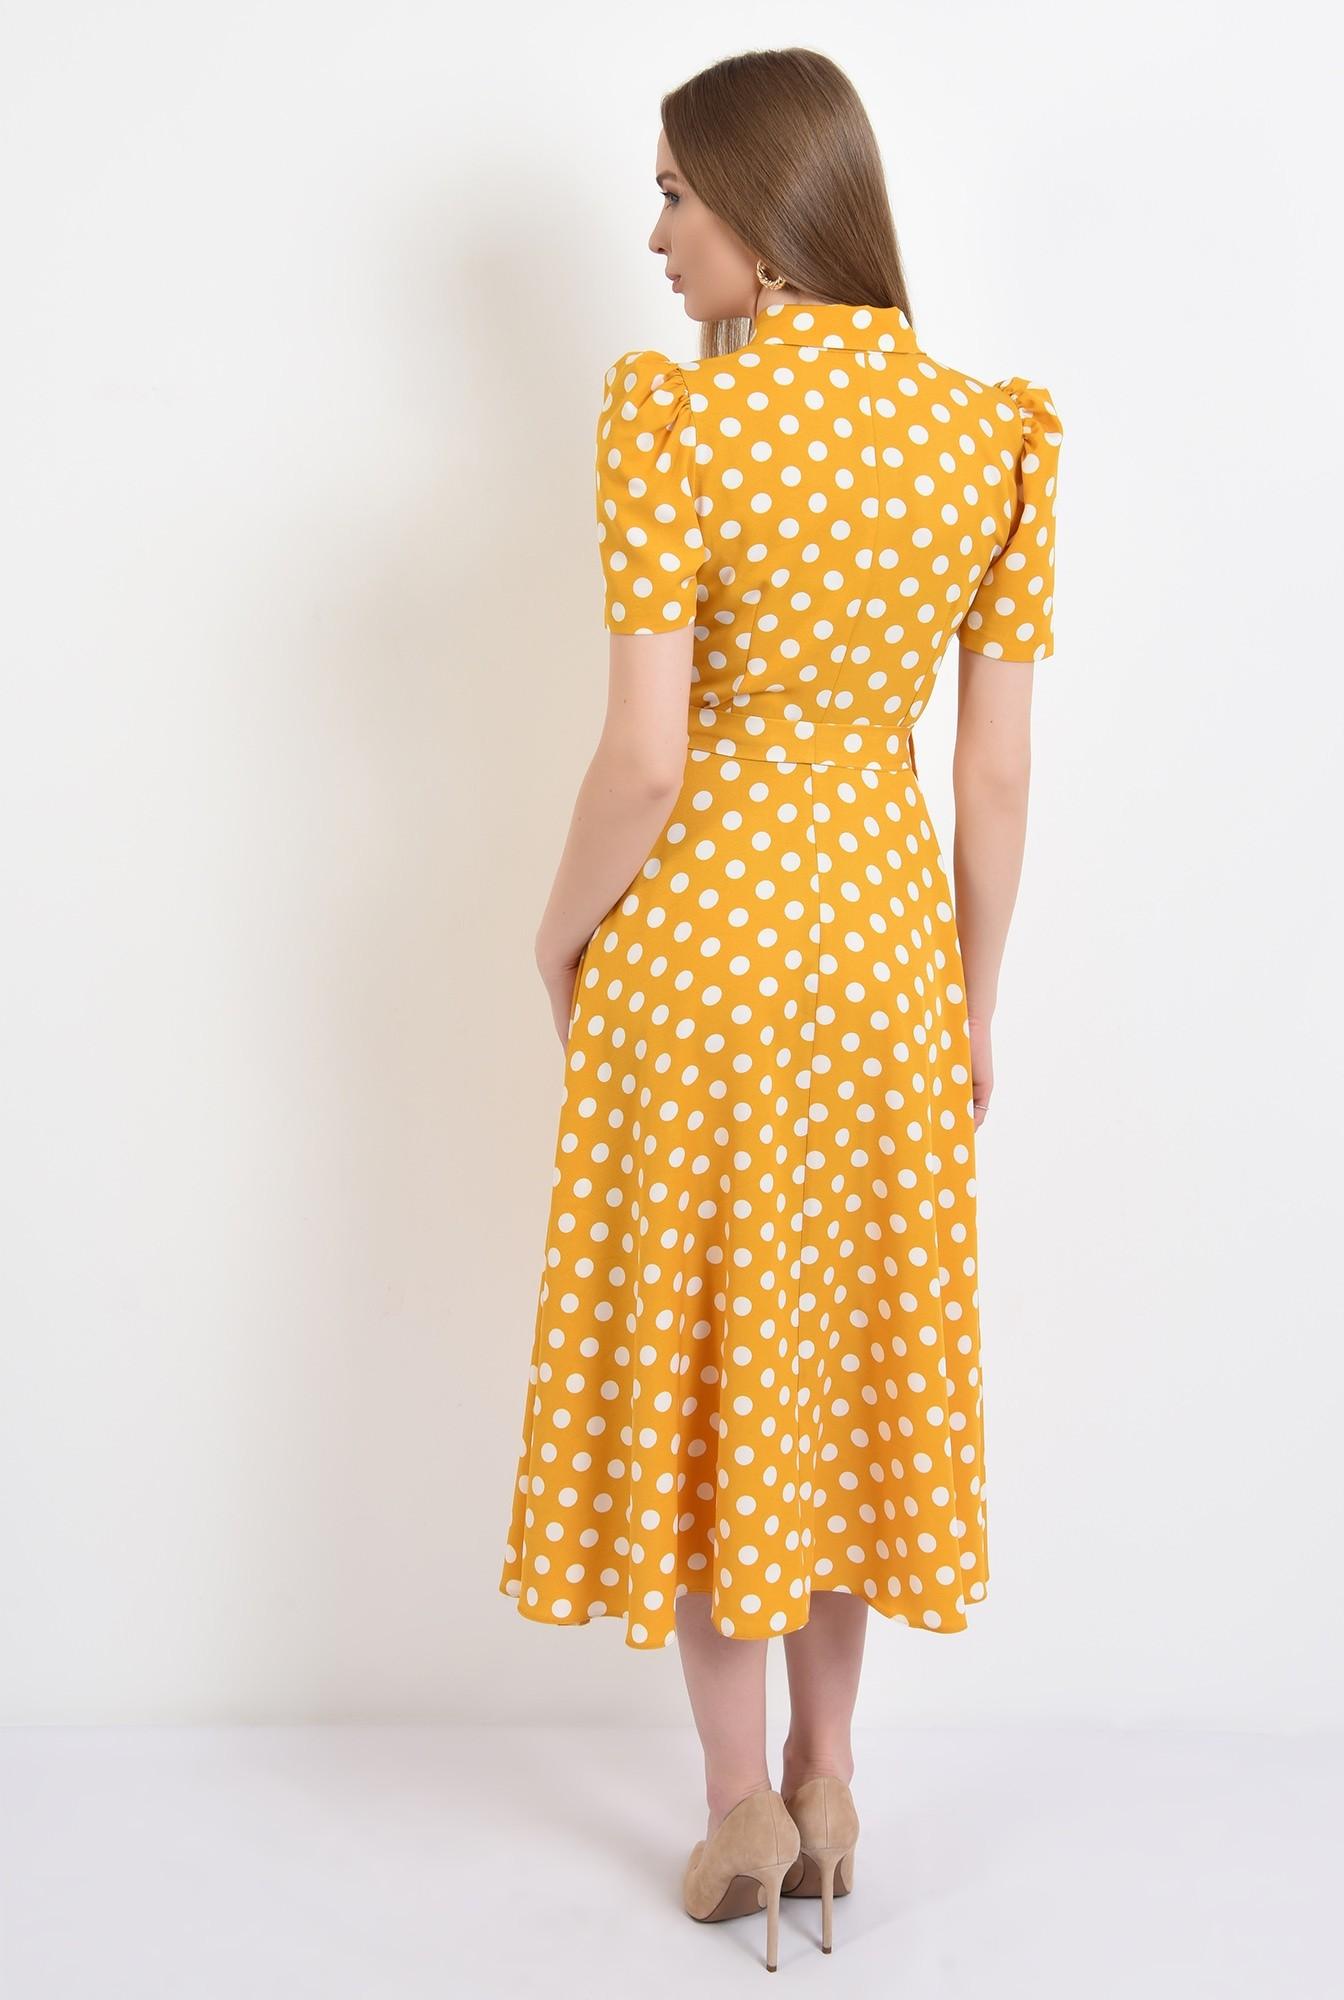 1 - 360 - rochie casual, evazata, cu nasturi, cu cordon, buline, Poema